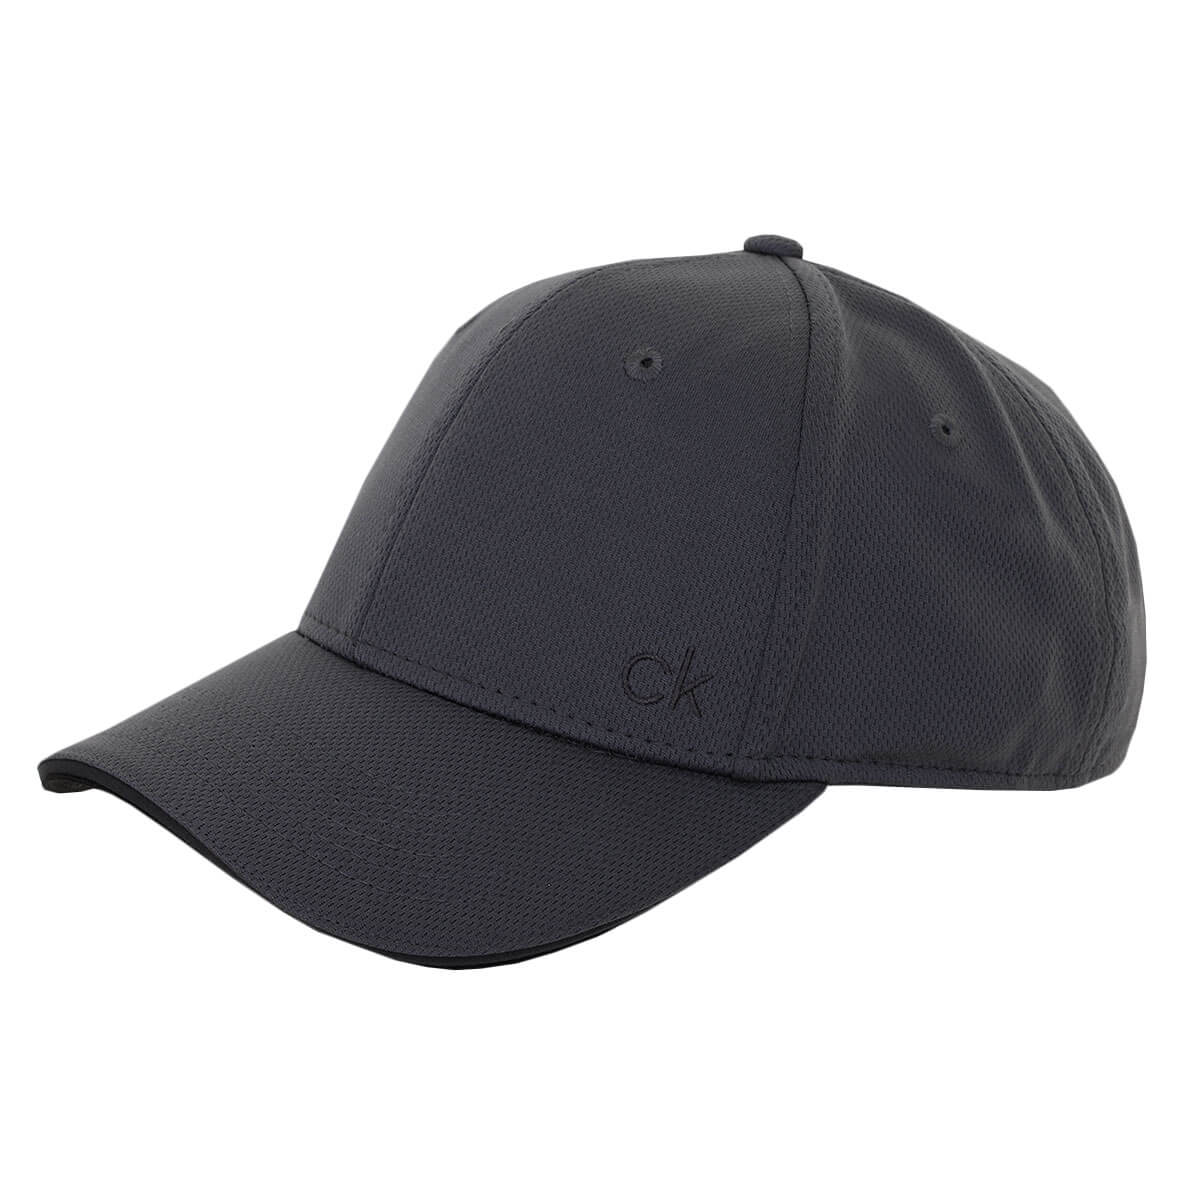 Calvin-Klein-Golf-2019-Airtex-Performance-Adjustable-Quick-Dry-Cap-40-OFF-RRP thumbnail 8